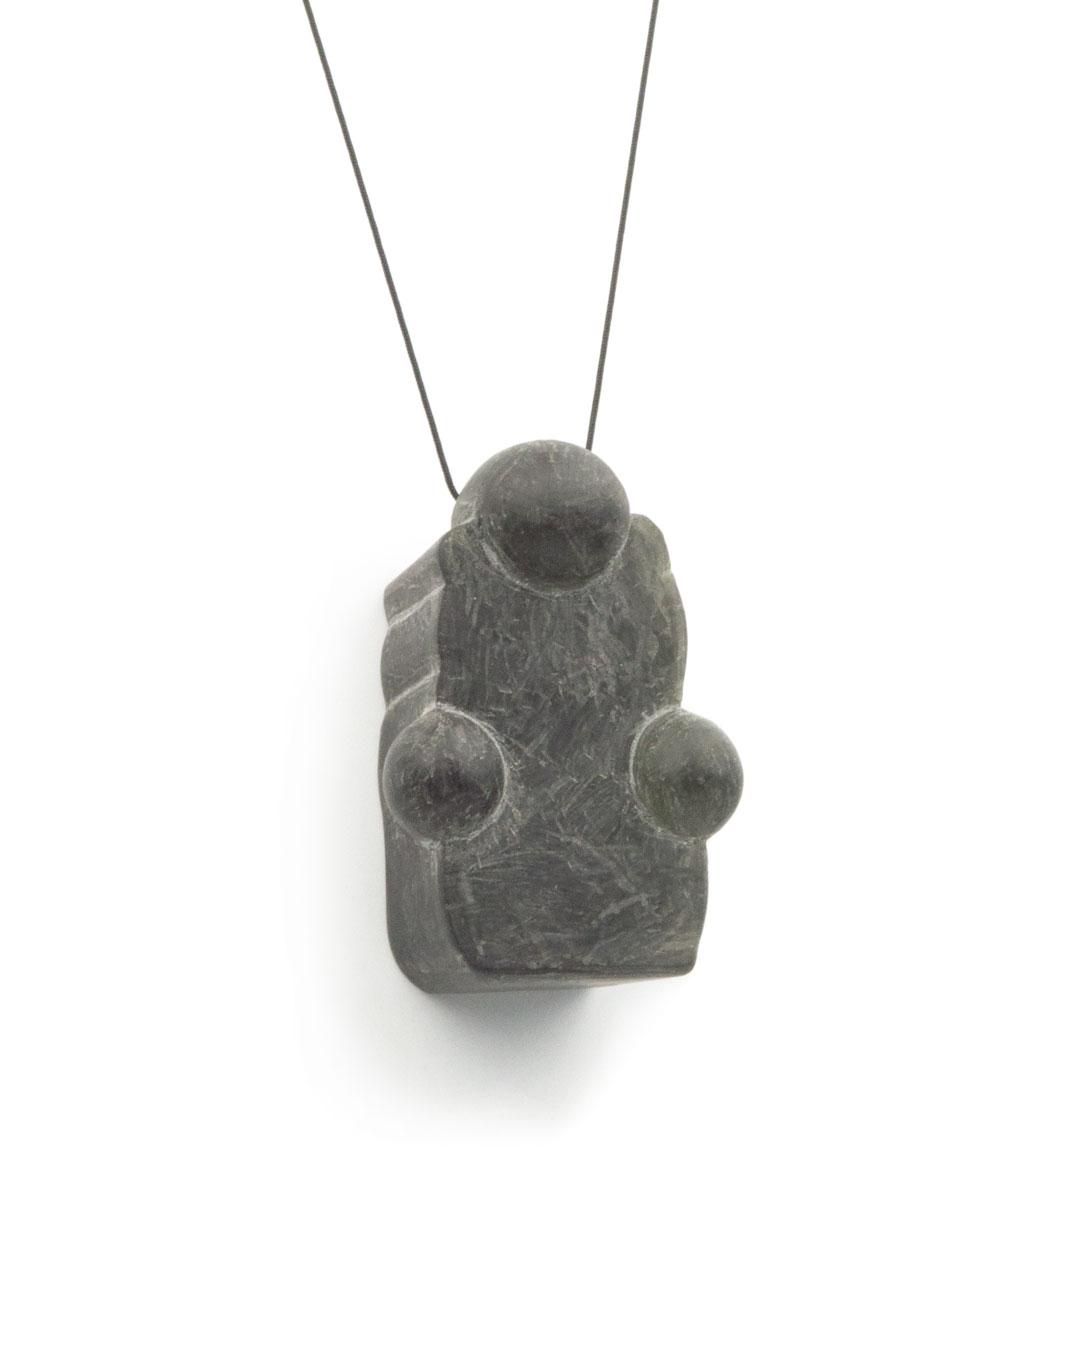 Florian Weichsberger, Idol, 2009-2013, pendant; plastic, 70 x 40 x 30 mm, €490